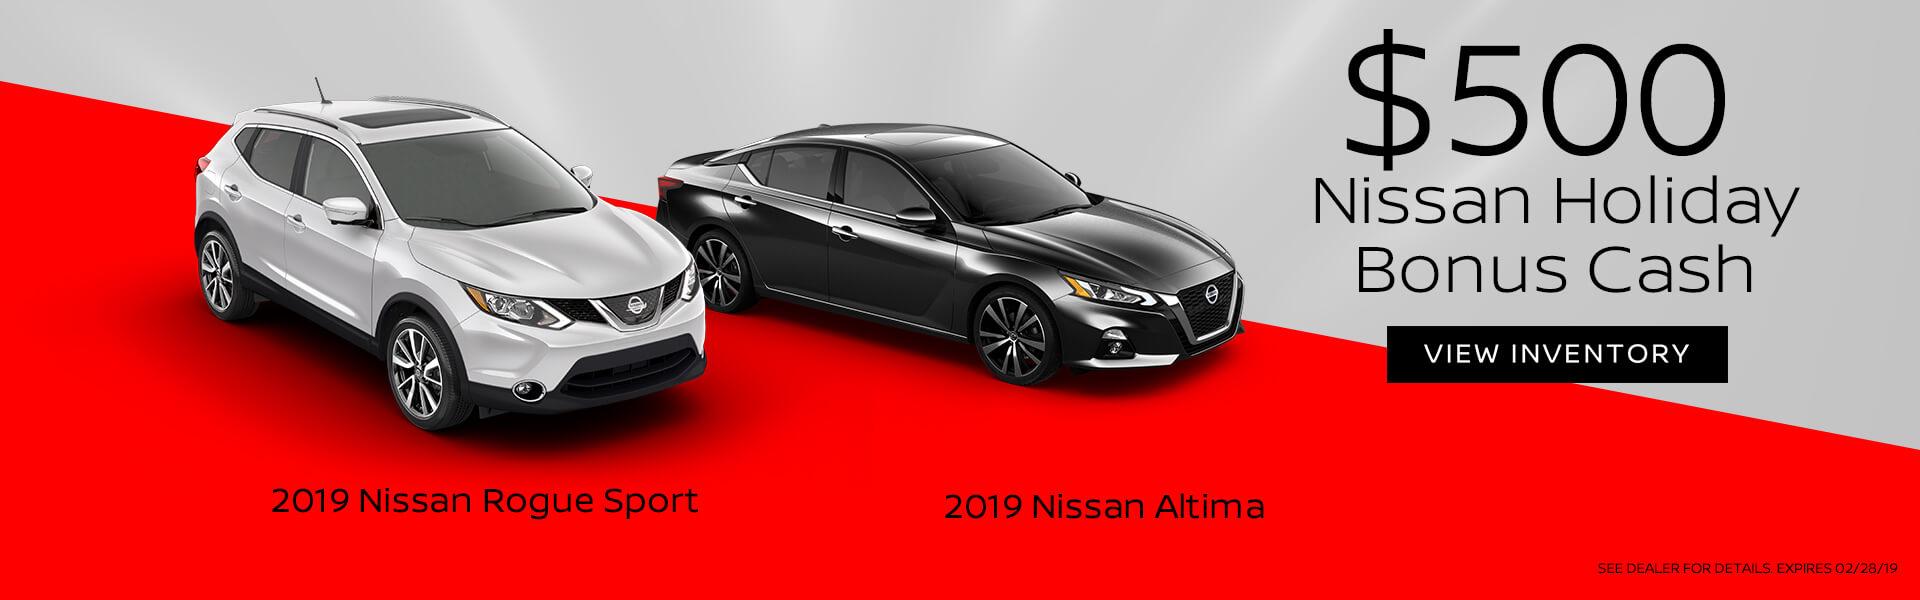 Nissan Holiday Bonus Cash